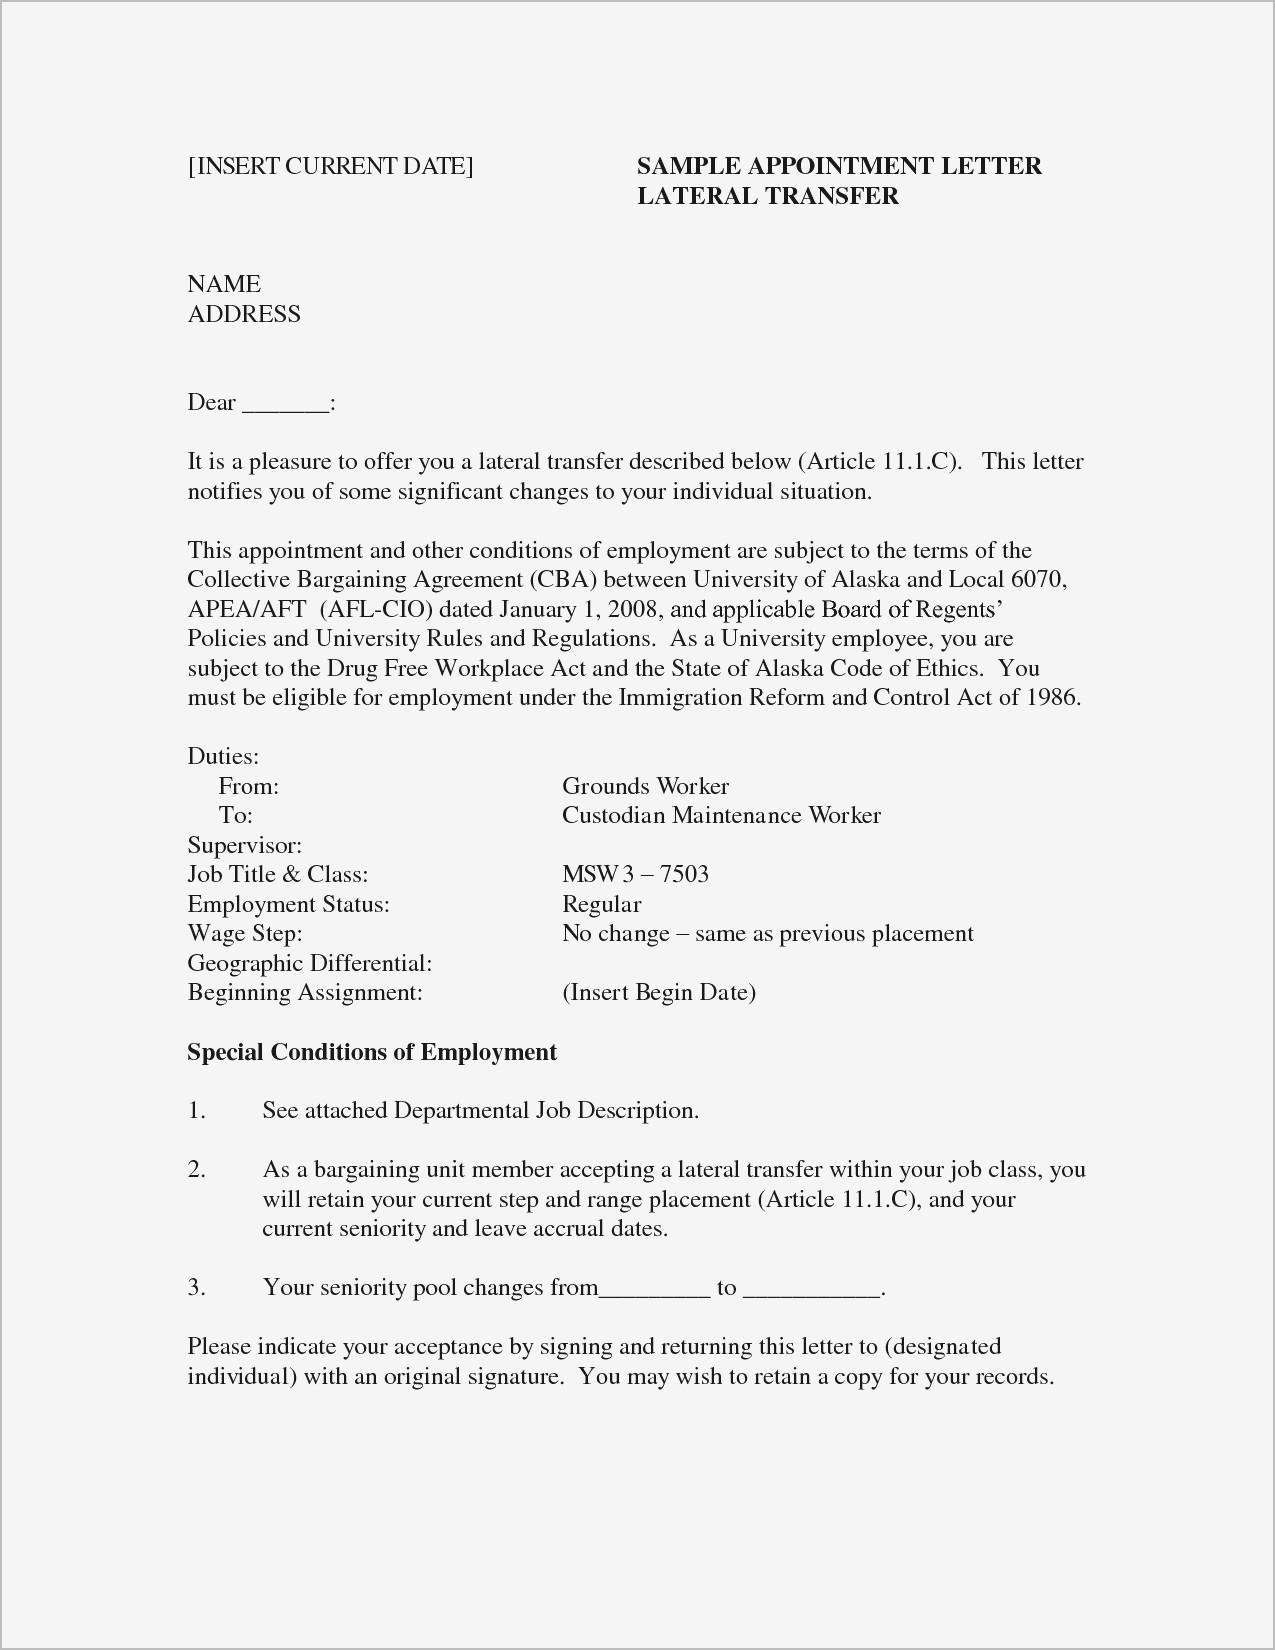 Job Acceptance Letter Template - Job Fer Acceptance Letter Inspirationa Job Fer Letter Template Us